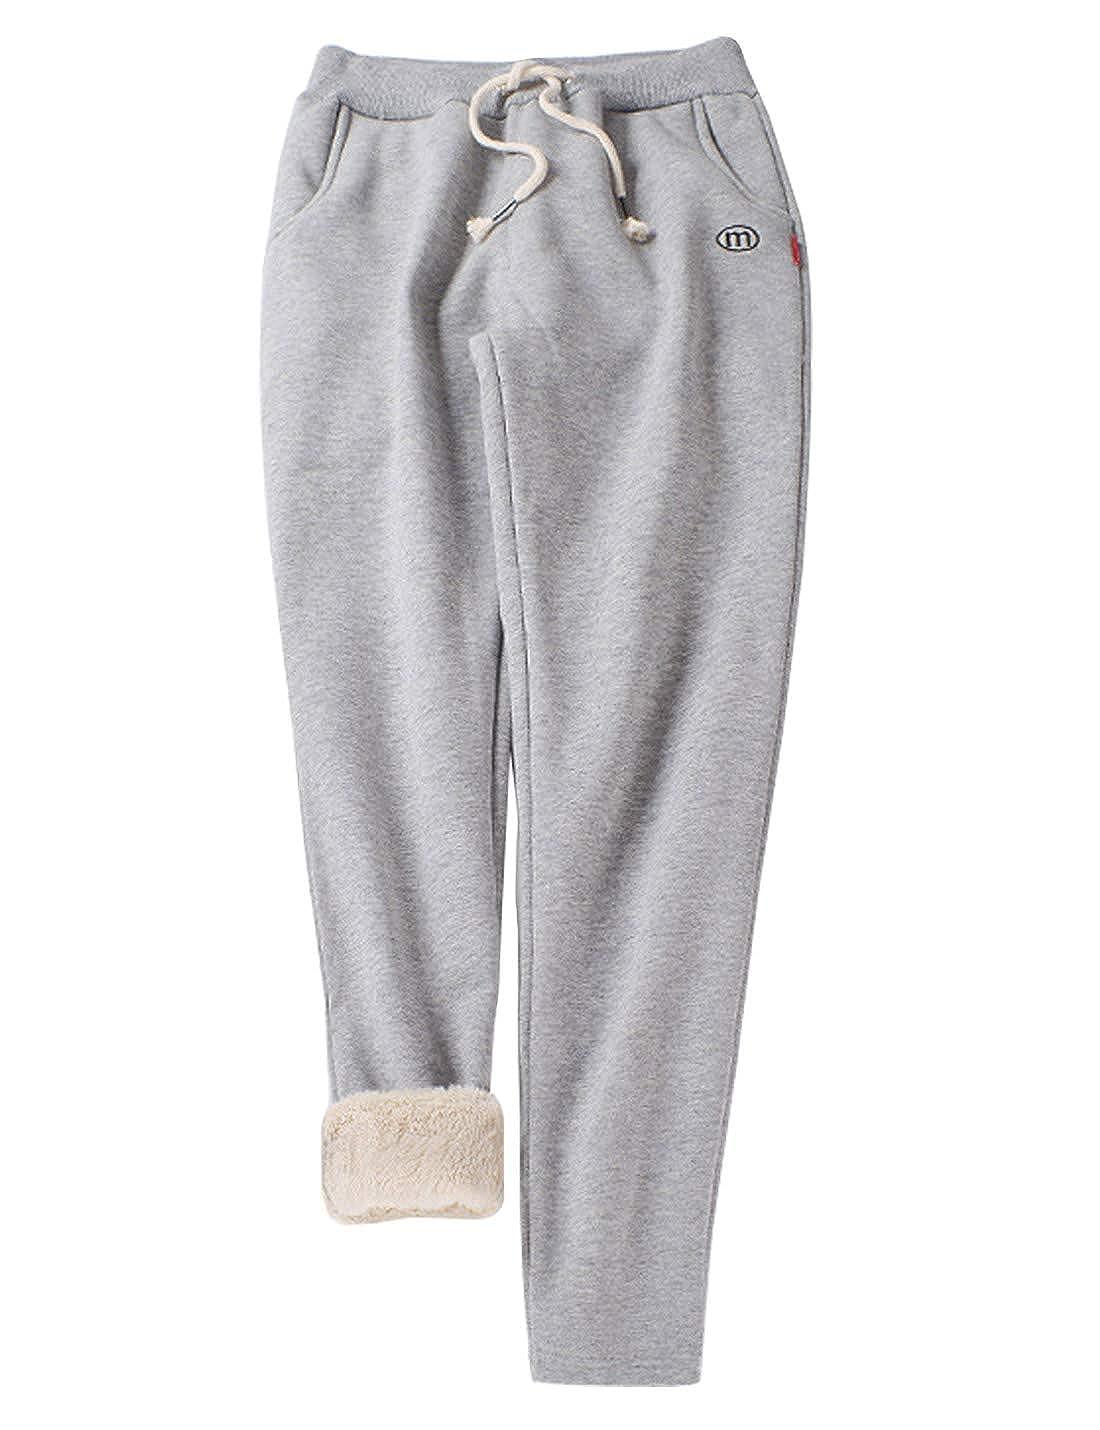 3  Light Grey (Tapered Leg) Gihuo Women's Winter Fleece Pants Sherpa Lined Sweatpants Active Running Jogger Pants